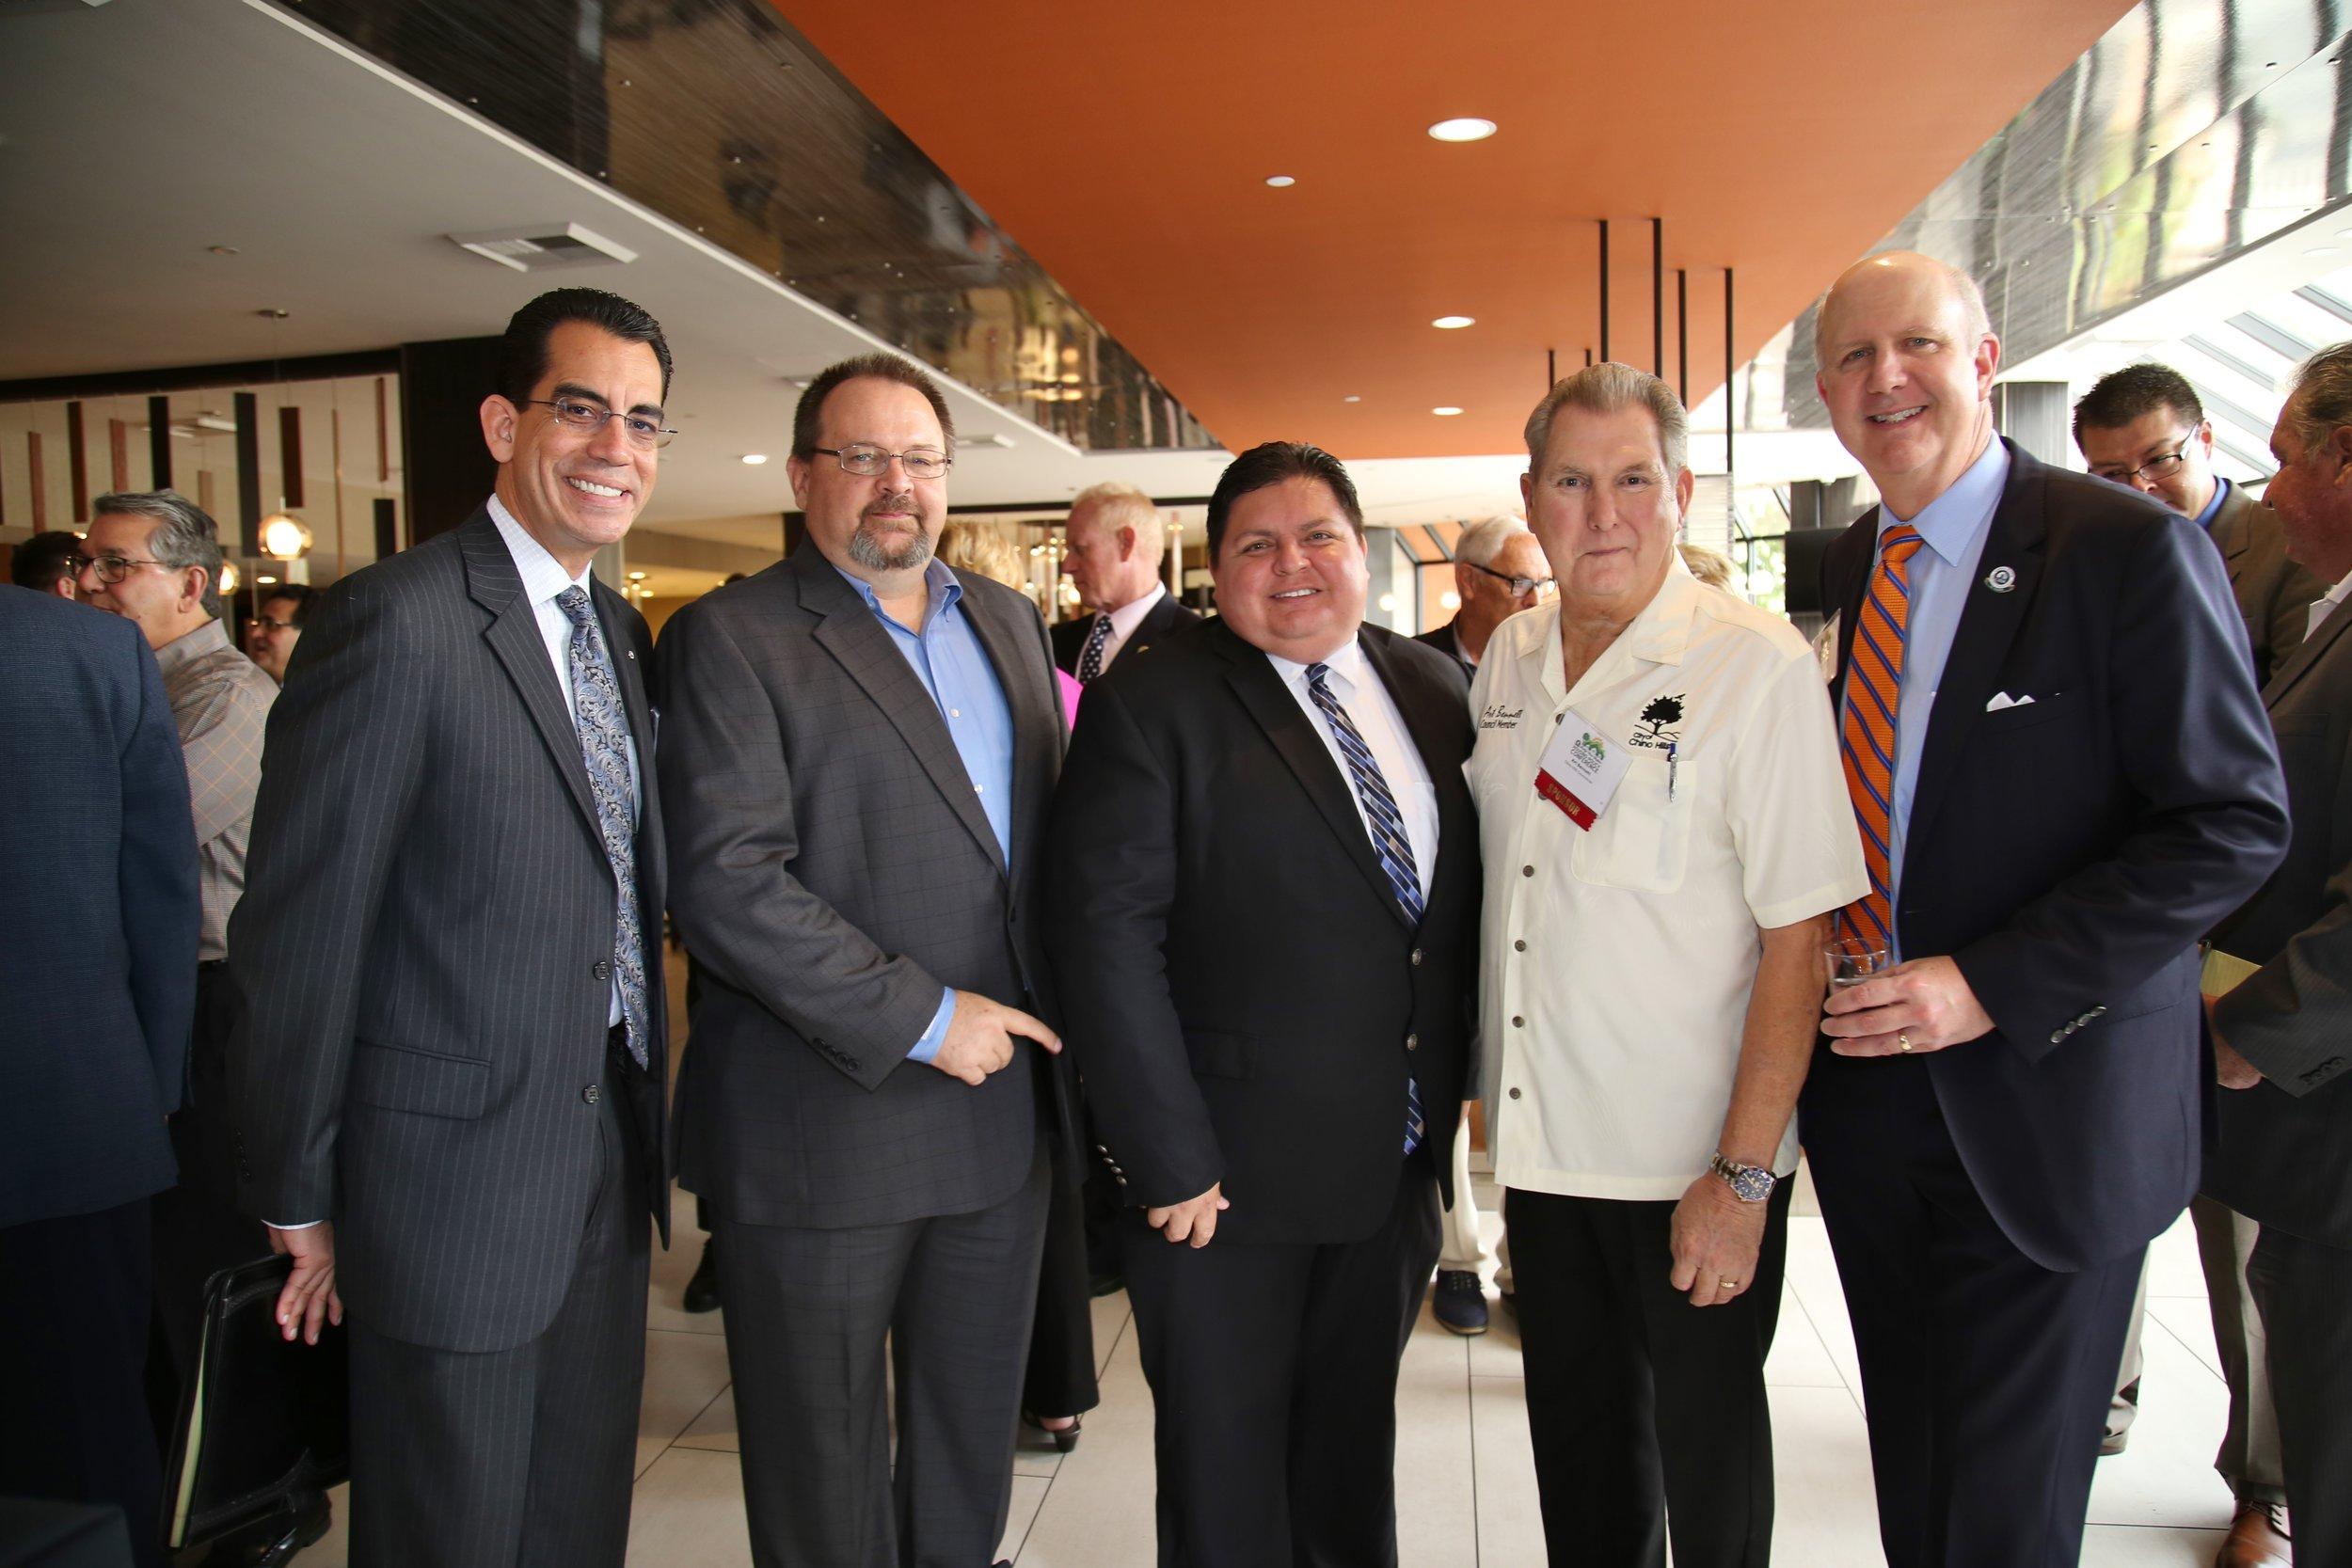 (From left to right) CEO Carlos Rodriguez, BIABV President Phil Burum, Rialto Councilmember Rafael Trujillo, Chino Hills Councilmember Art Bennett, CBIA CEO Dan Dunmoyer.